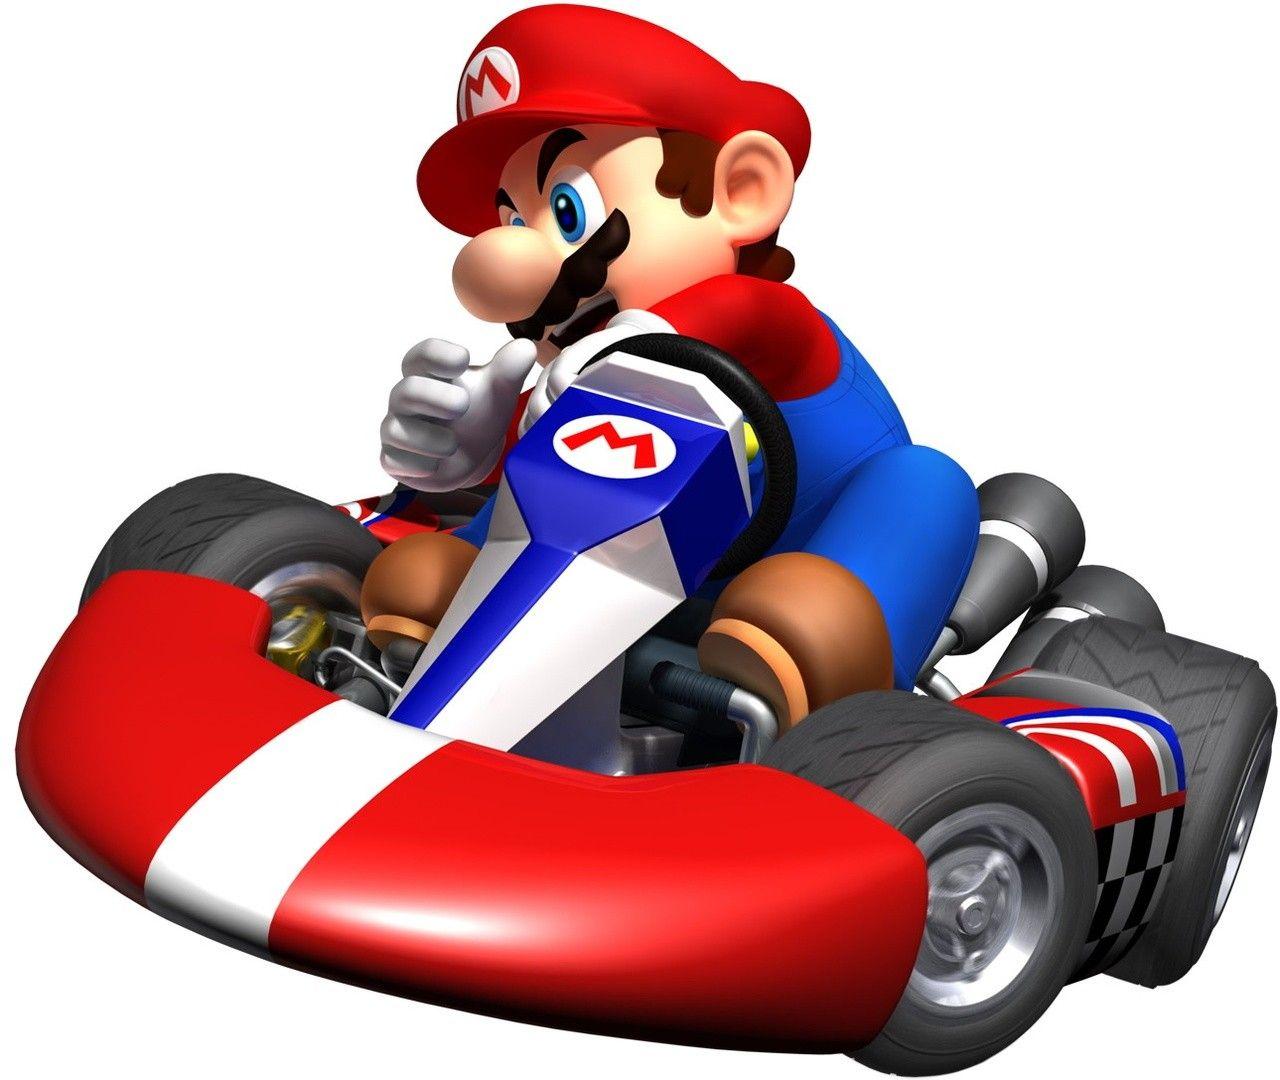 Mario Mario Kart Wii Super Mario Kart Mario Kart